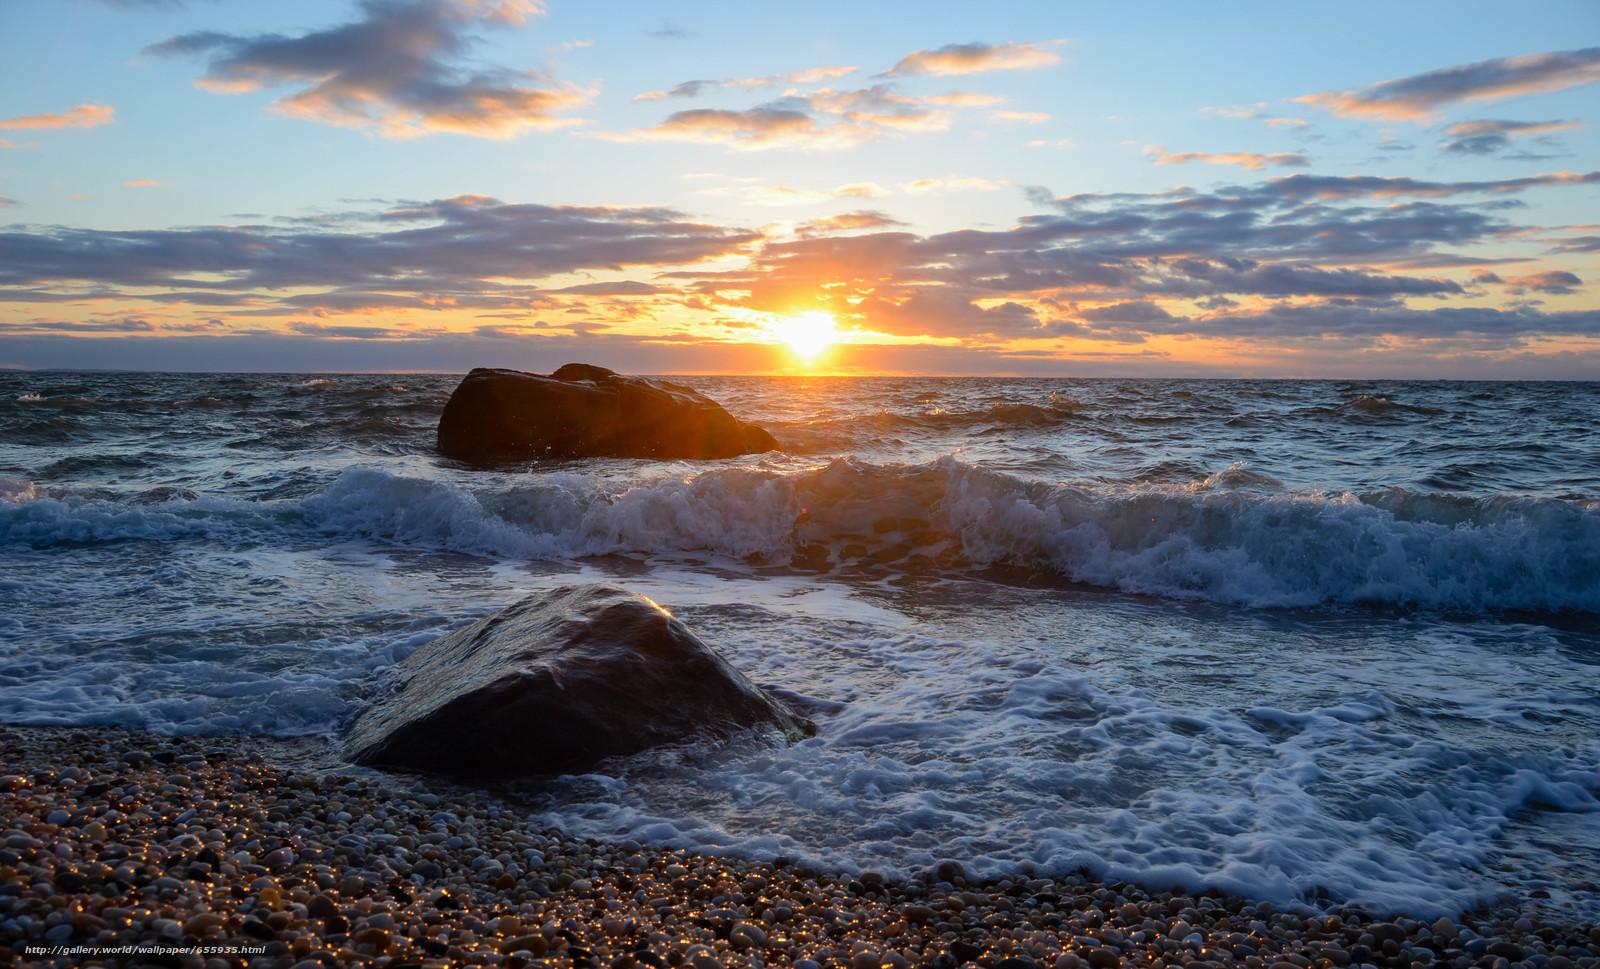 Download wallpaper sunset,  sea,  waves,  landscape free desktop wallpaper in the resolution 4928x2986 — picture №655935